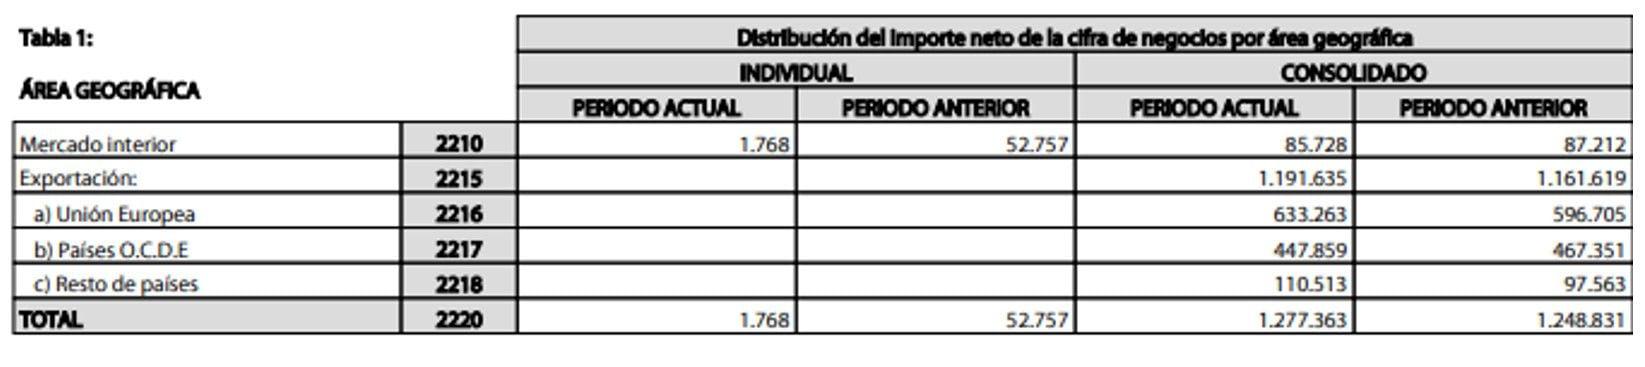 Ventas por Area Geográfica Ebro Foods 1S 2018